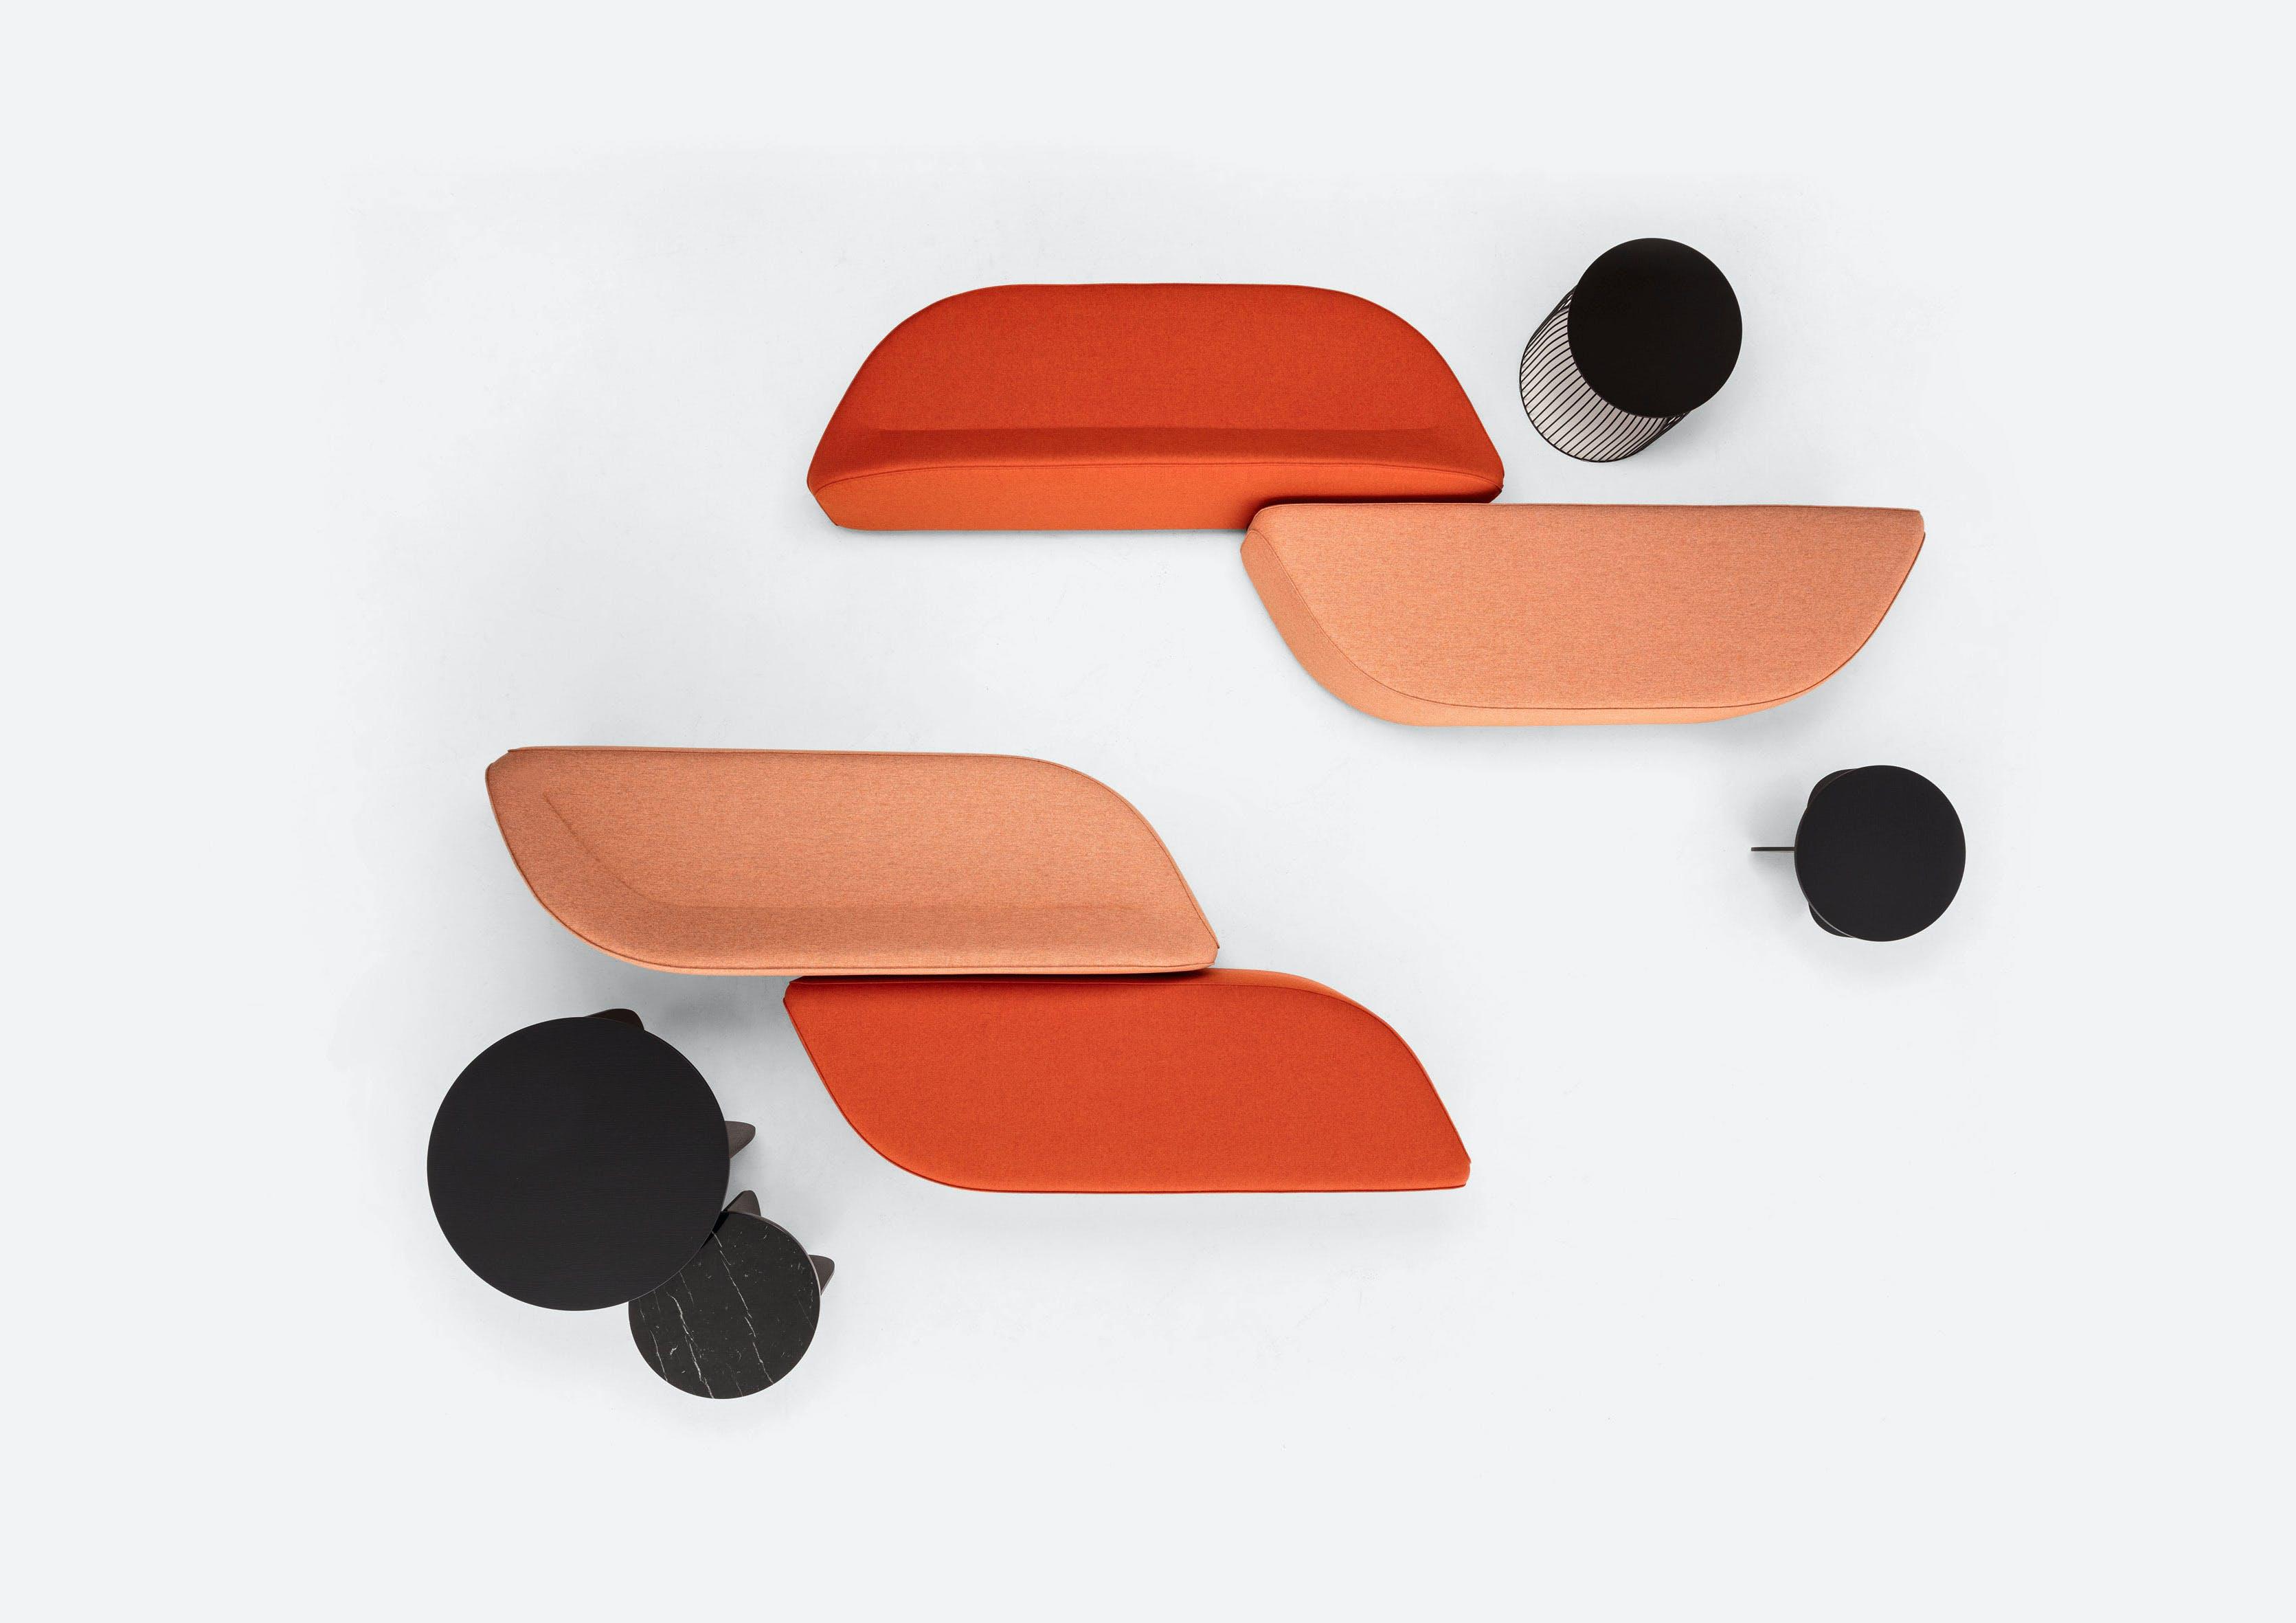 Waves-modular-system-by-la-cividina-available-at-haute-living